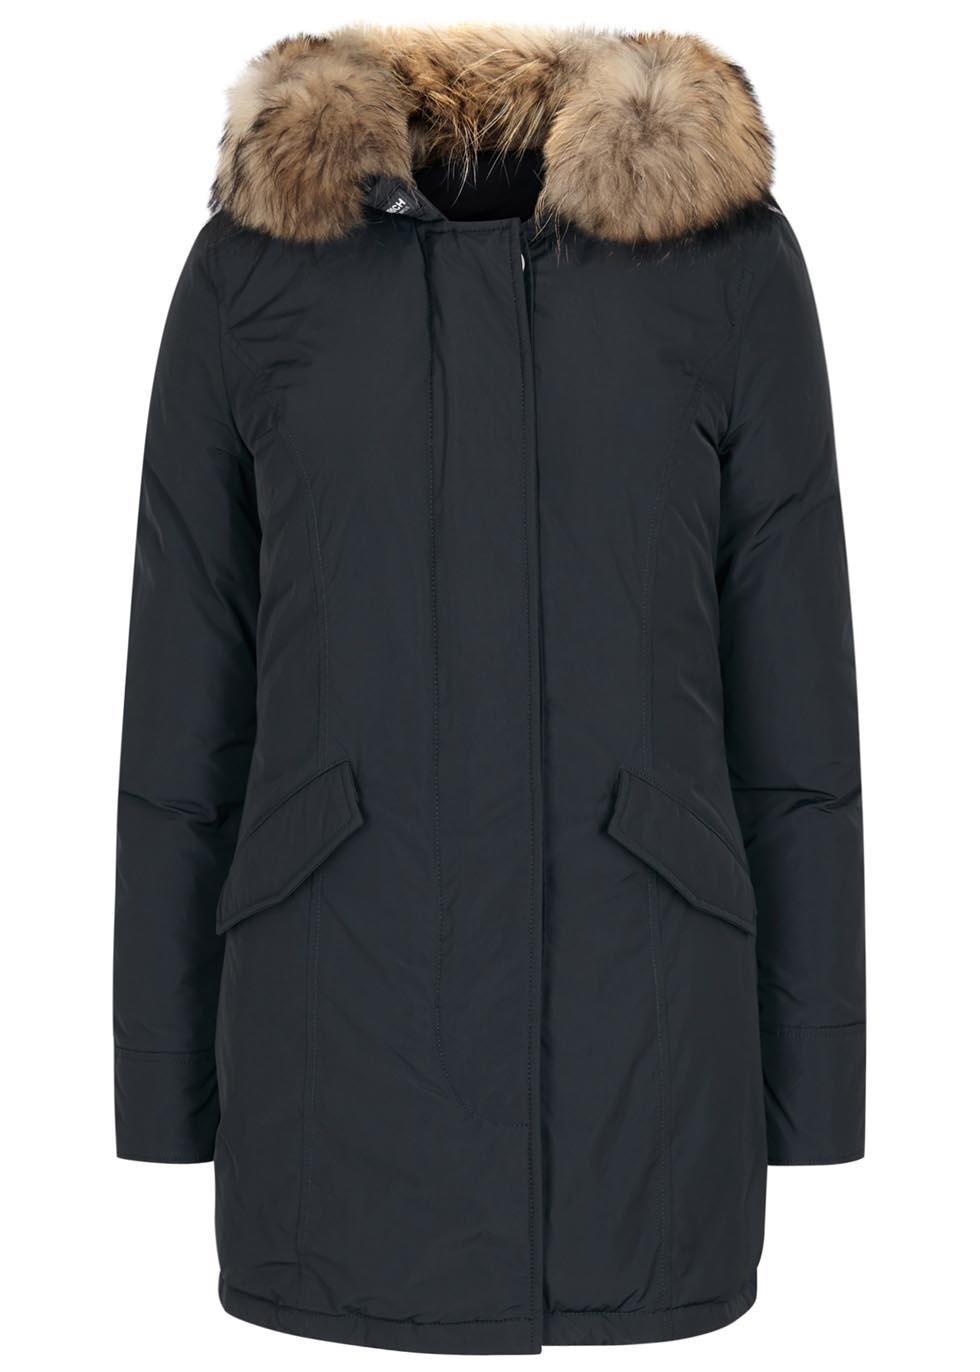 Woolrich luxury arctic navy fur-trimmed parka- £630 from Harvey Nichols.jpg